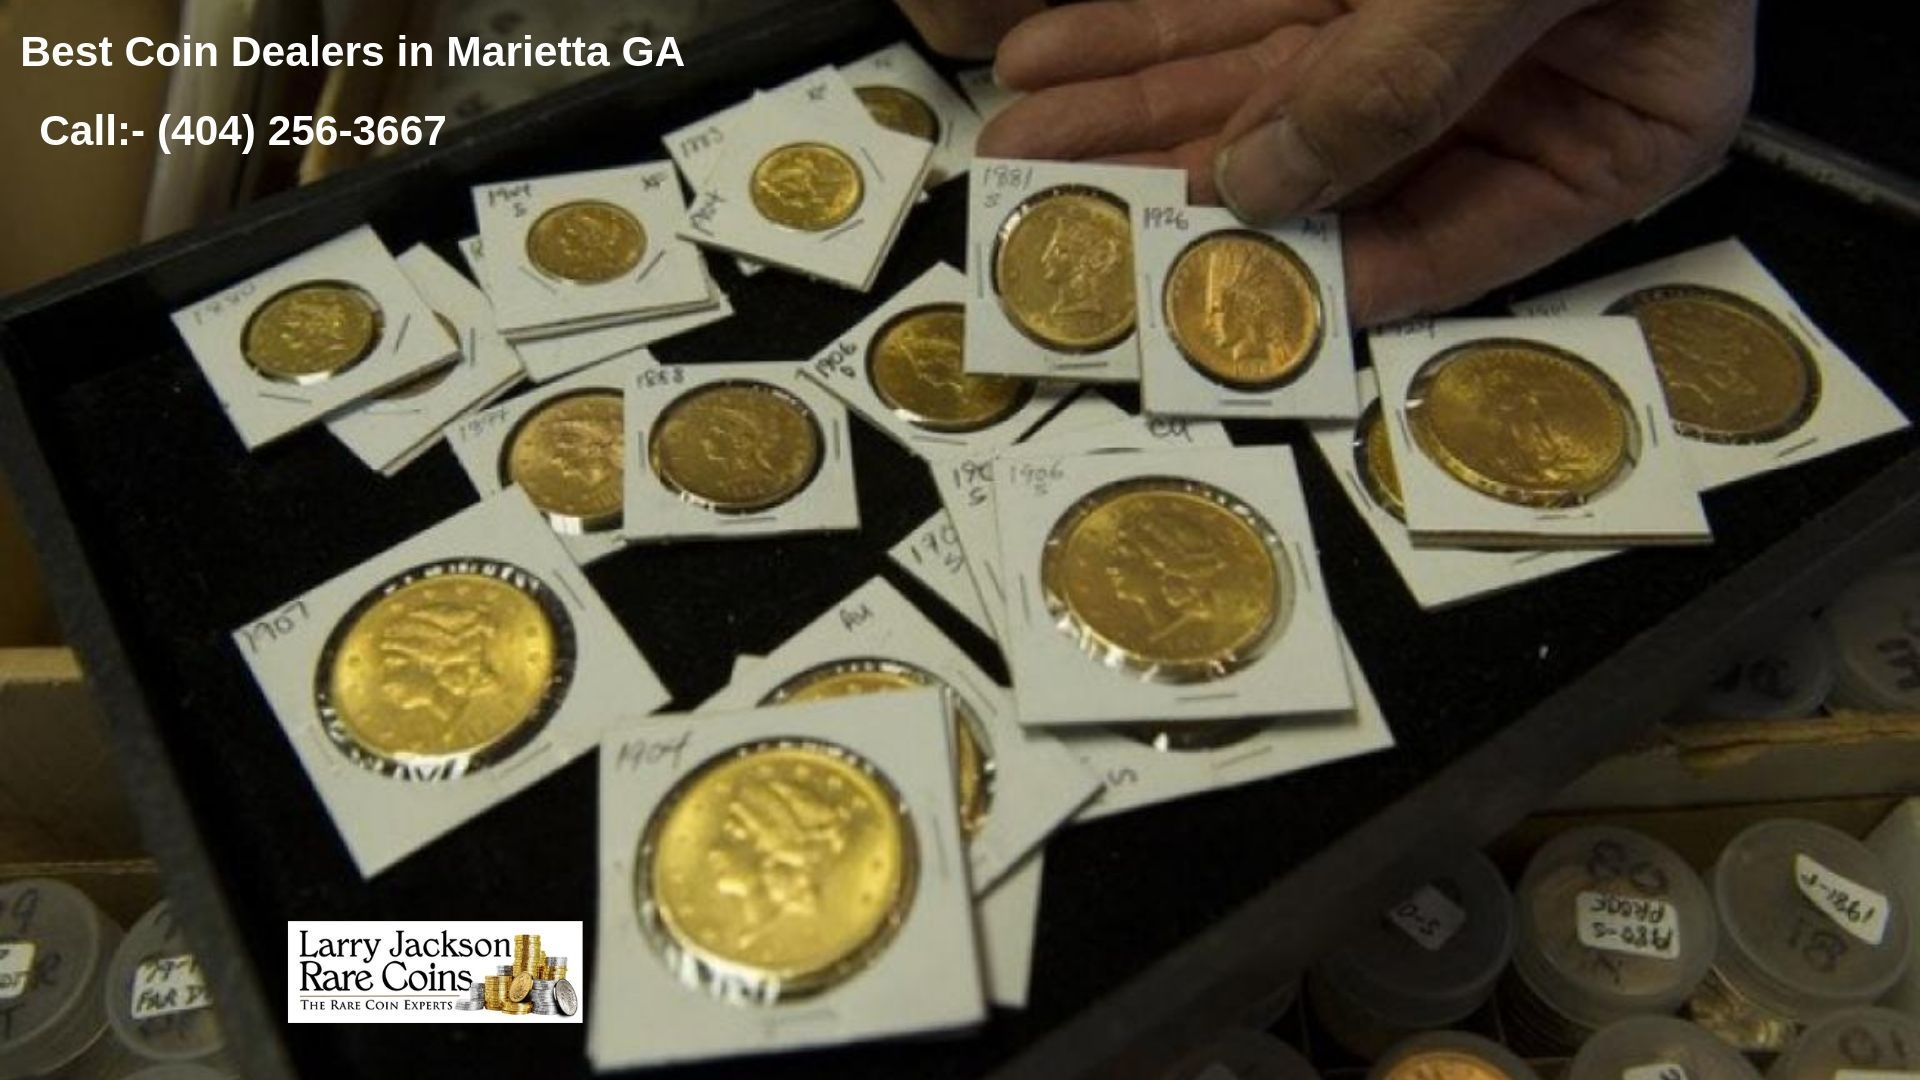 Coins Marietta Gold Silver Coins Rare Coin Larry Jackson Larry Jackson Numismatics Coin Dealers Coins Silver Bullion